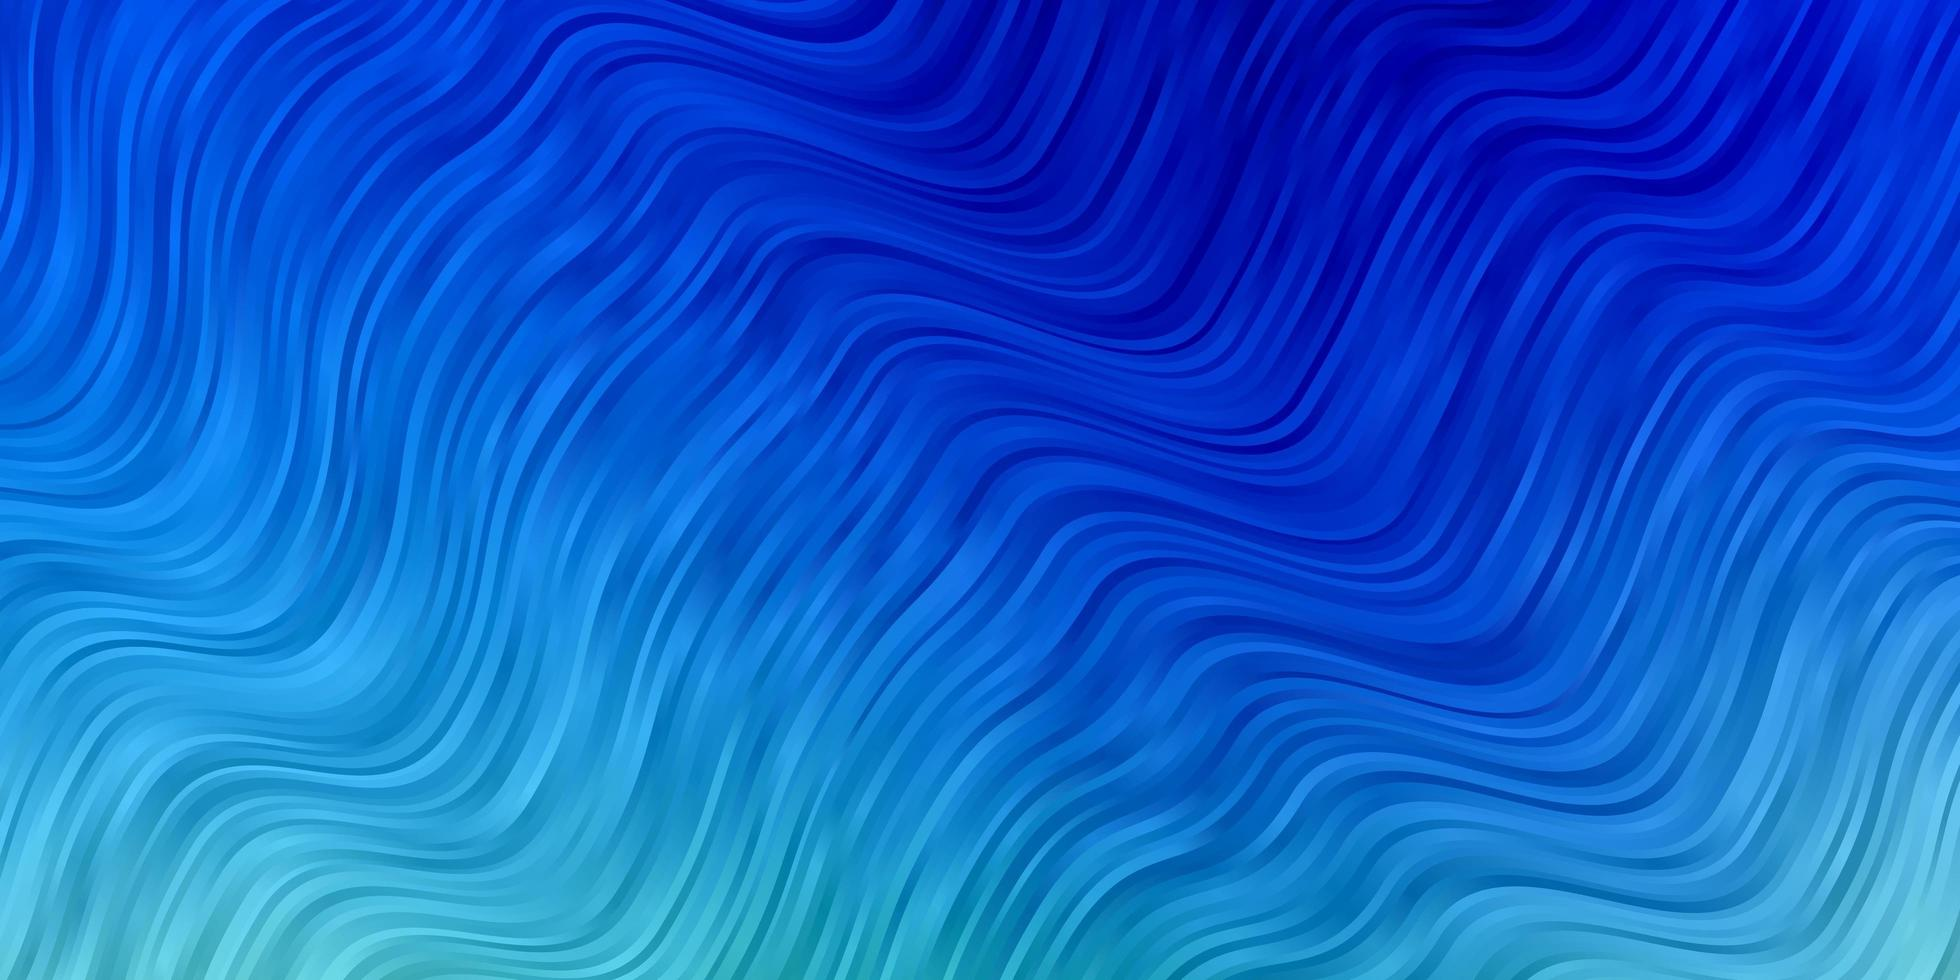 hellblaues, grünes Vektormuster mit gekrümmten Linien. vektor